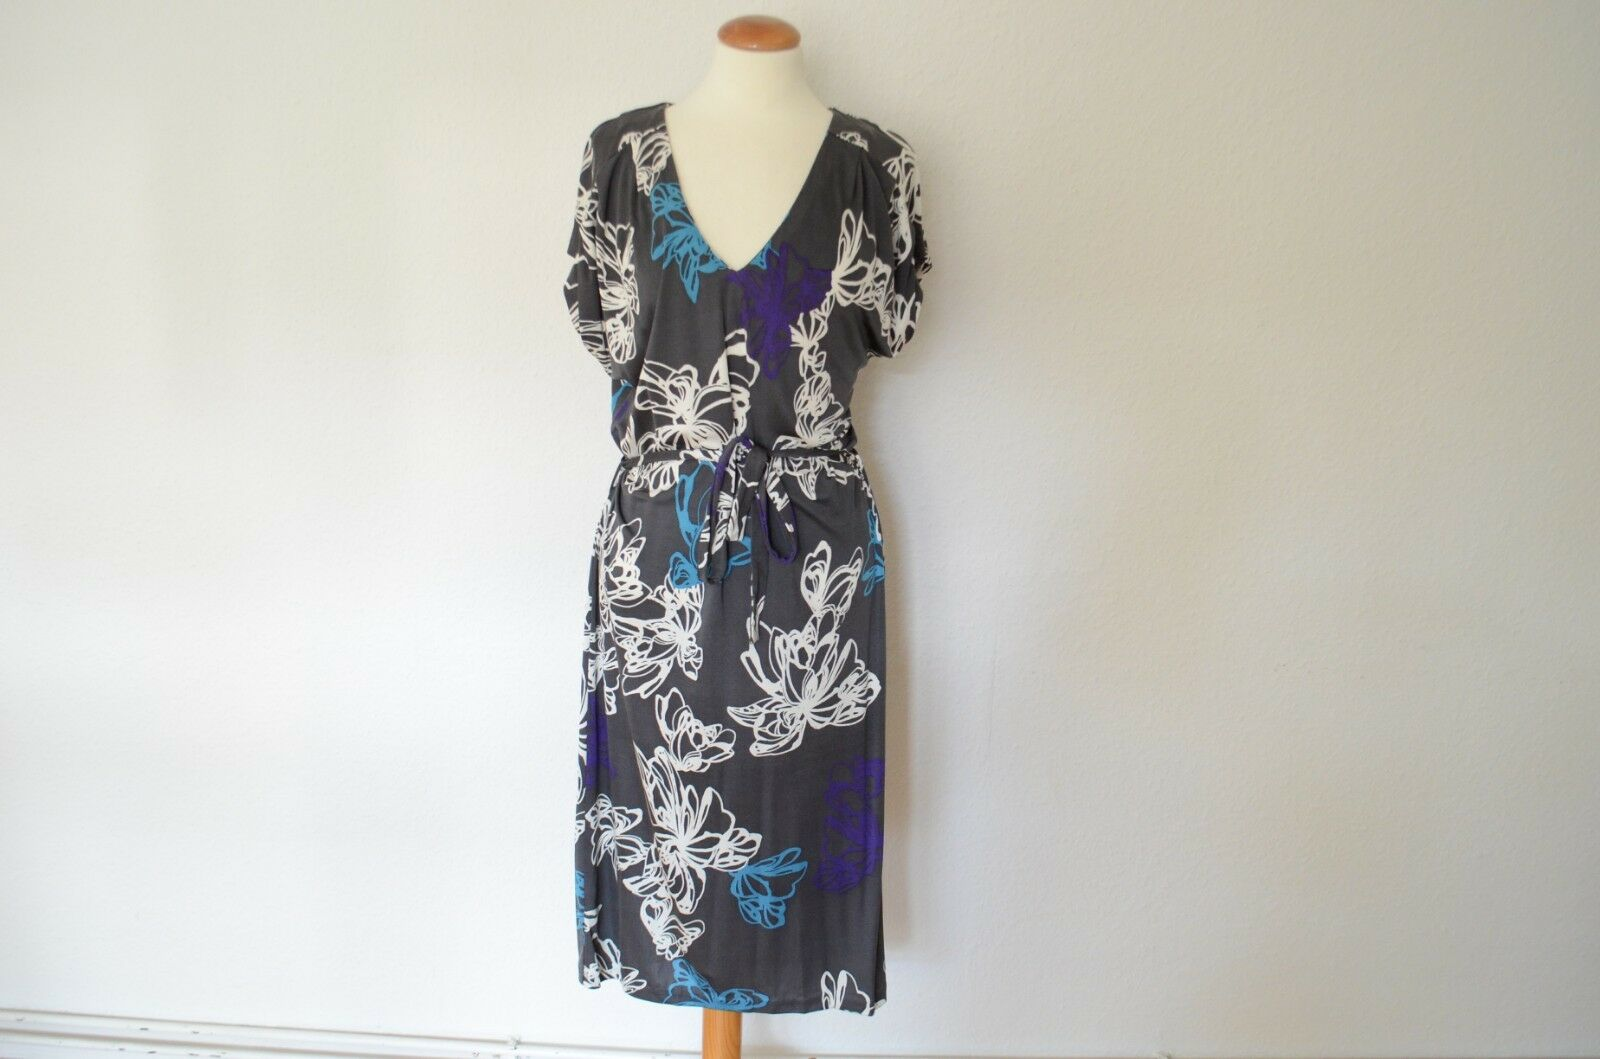 HUGO BOSS Jersey Kleid mit Gürtel wie NEU  M 38 100% Seide knielang